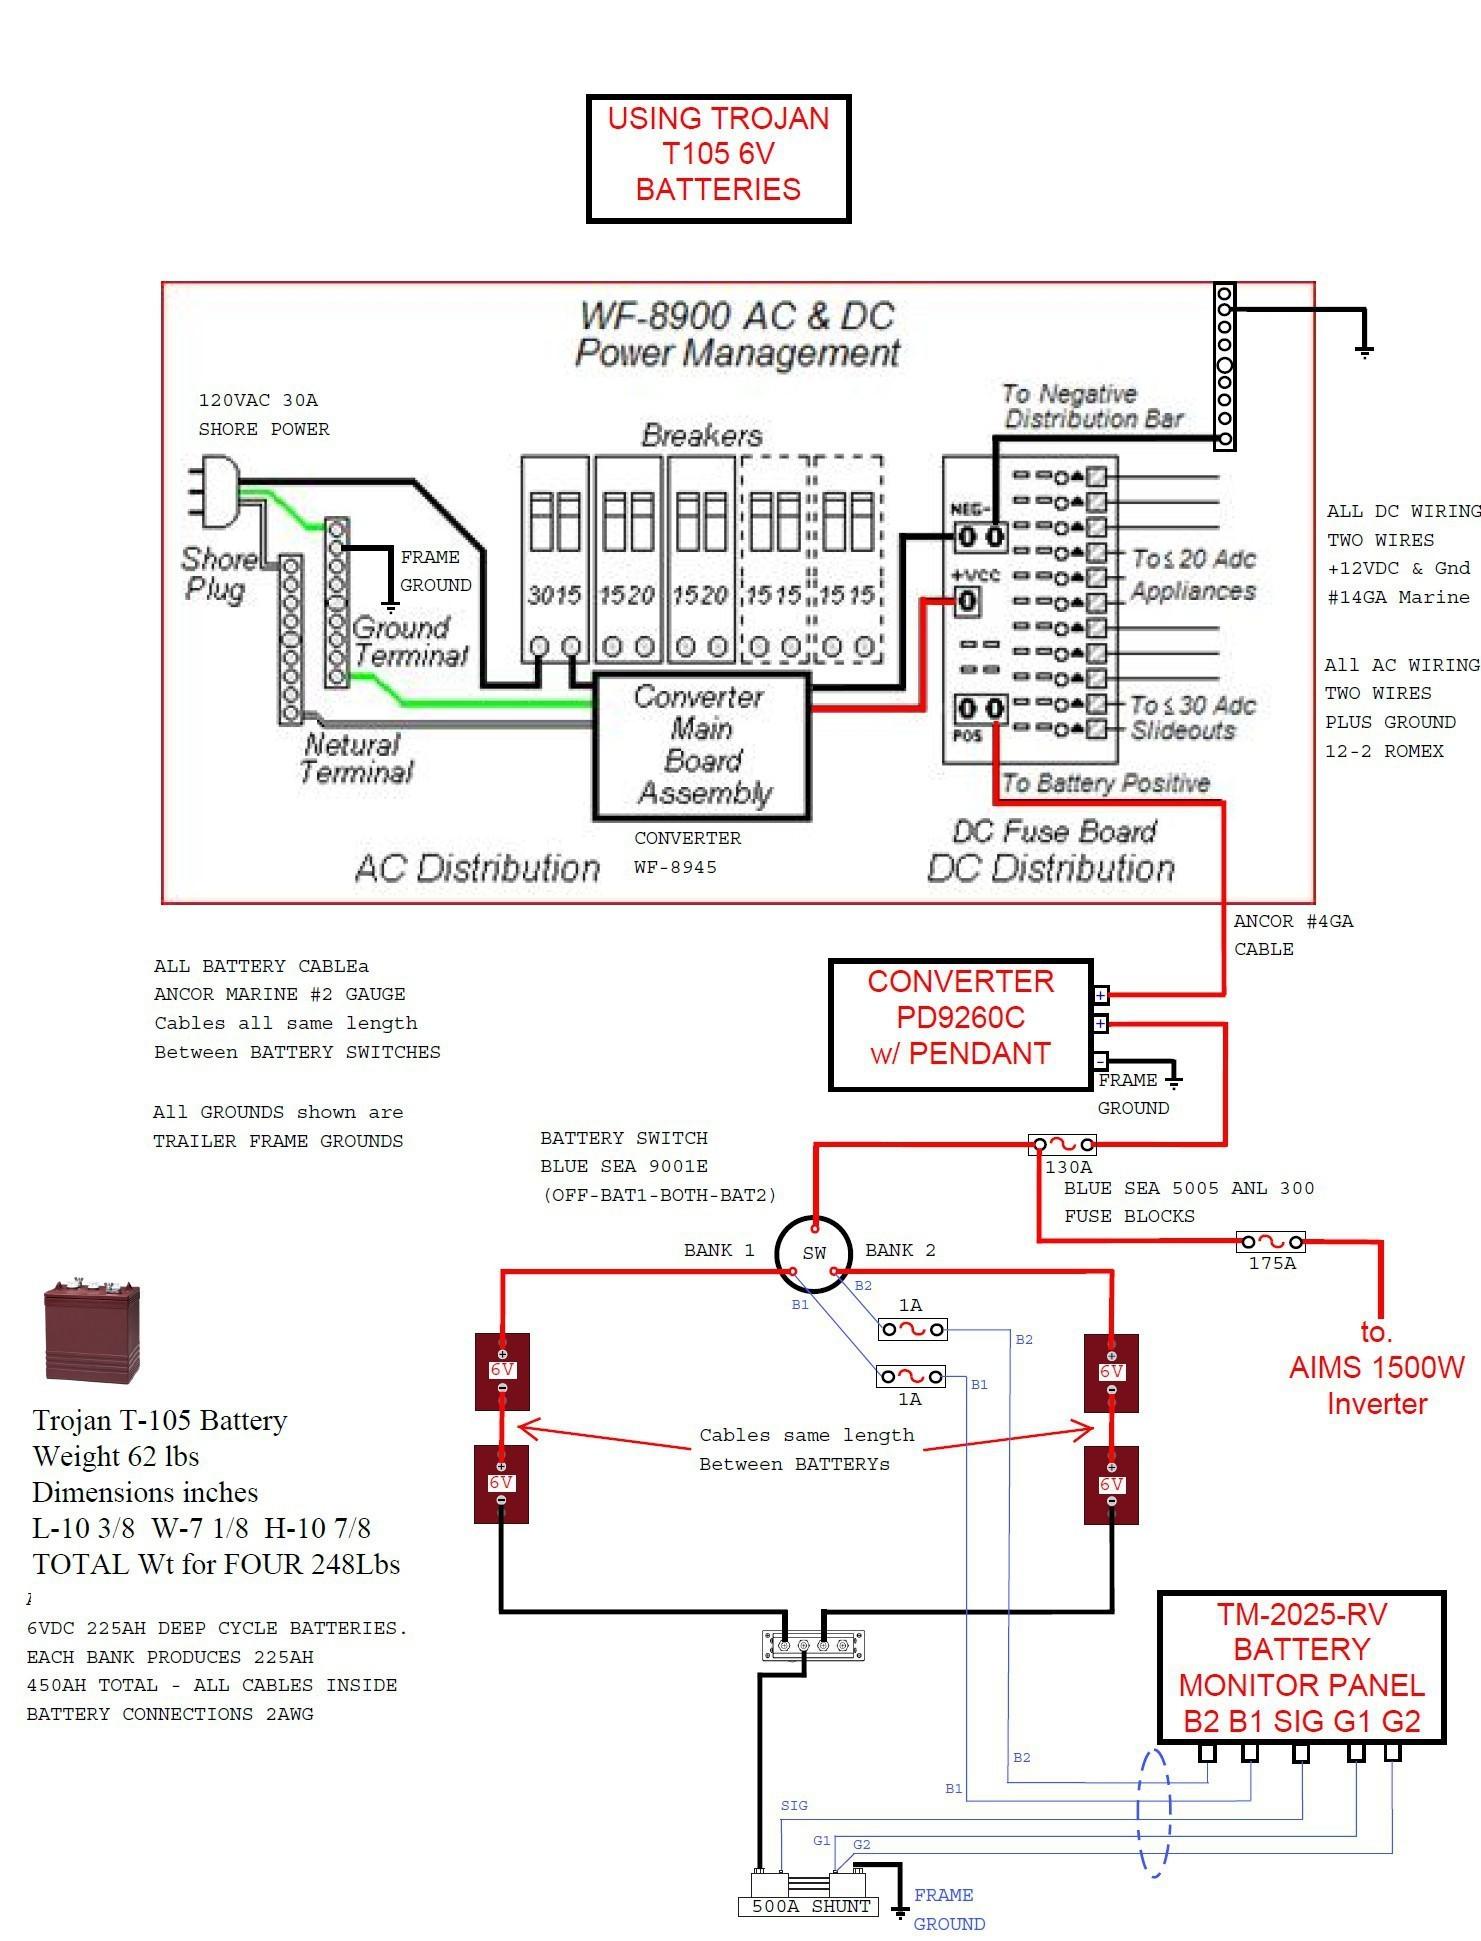 kib monitor panel wiring diagram inspirational kib micro monitor wiring diagram schematics wiring diagrams e280a2 of kib monitor panel wiring diagram